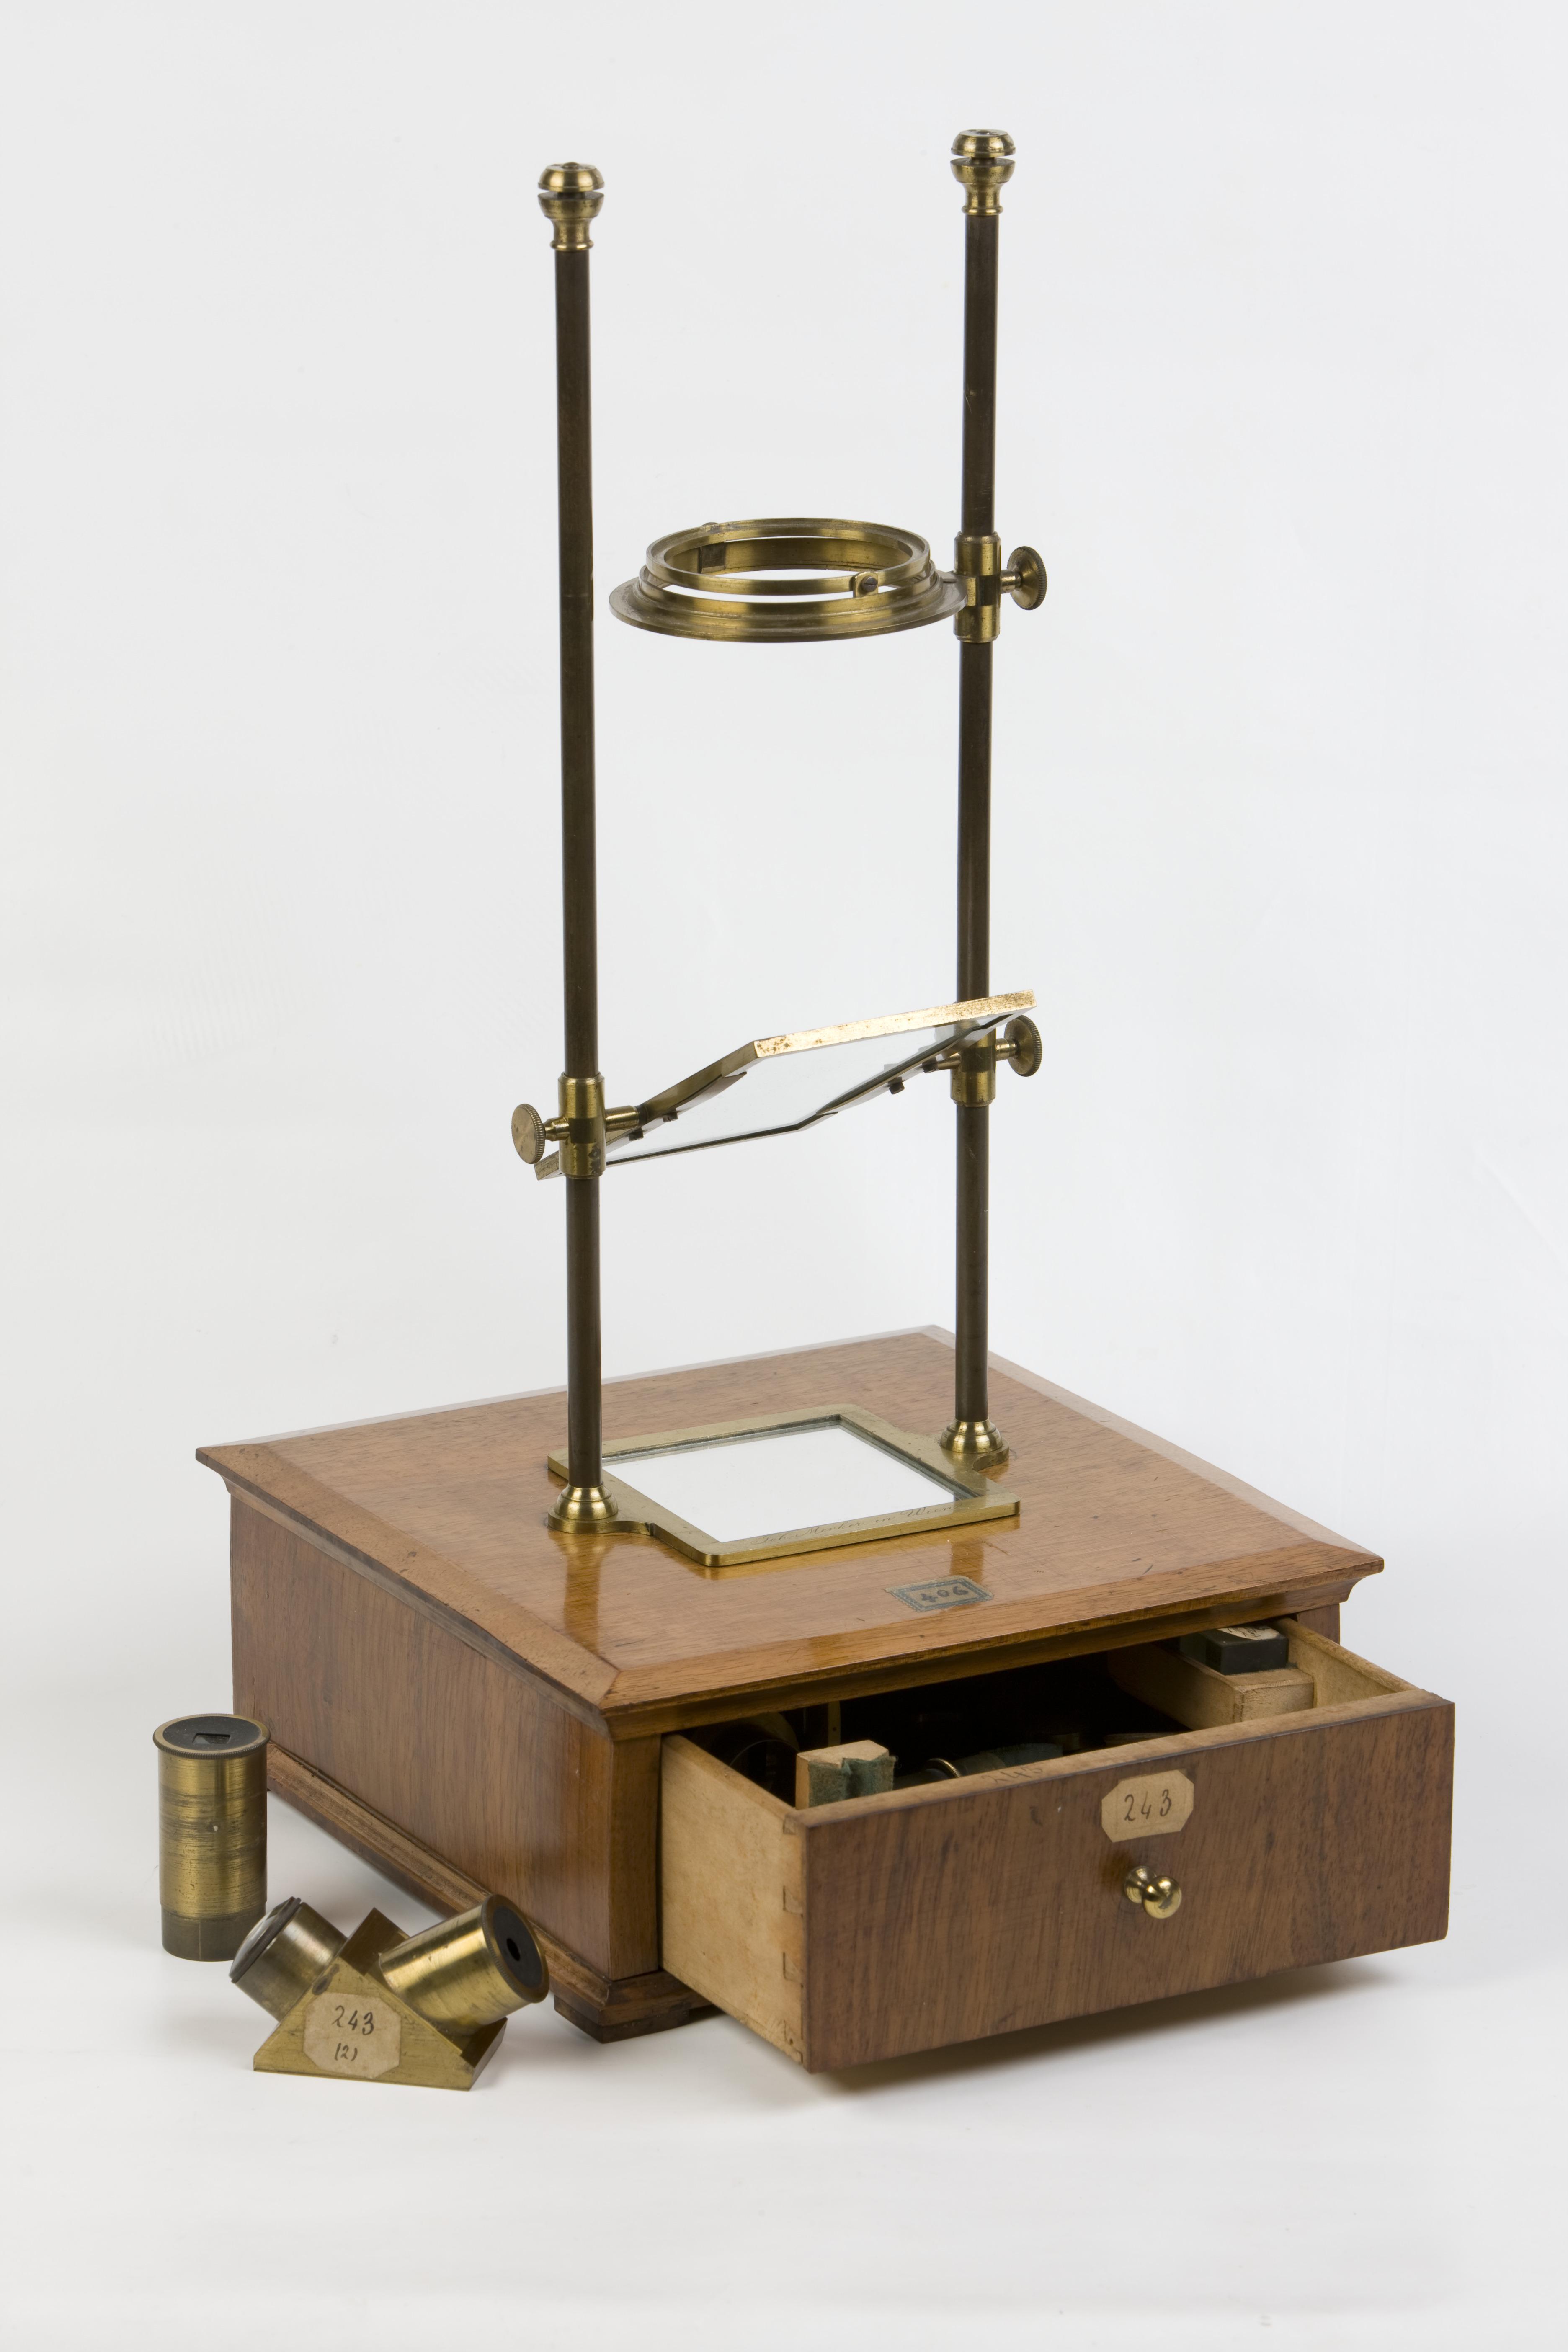 15- Polariscopio di Norremberg